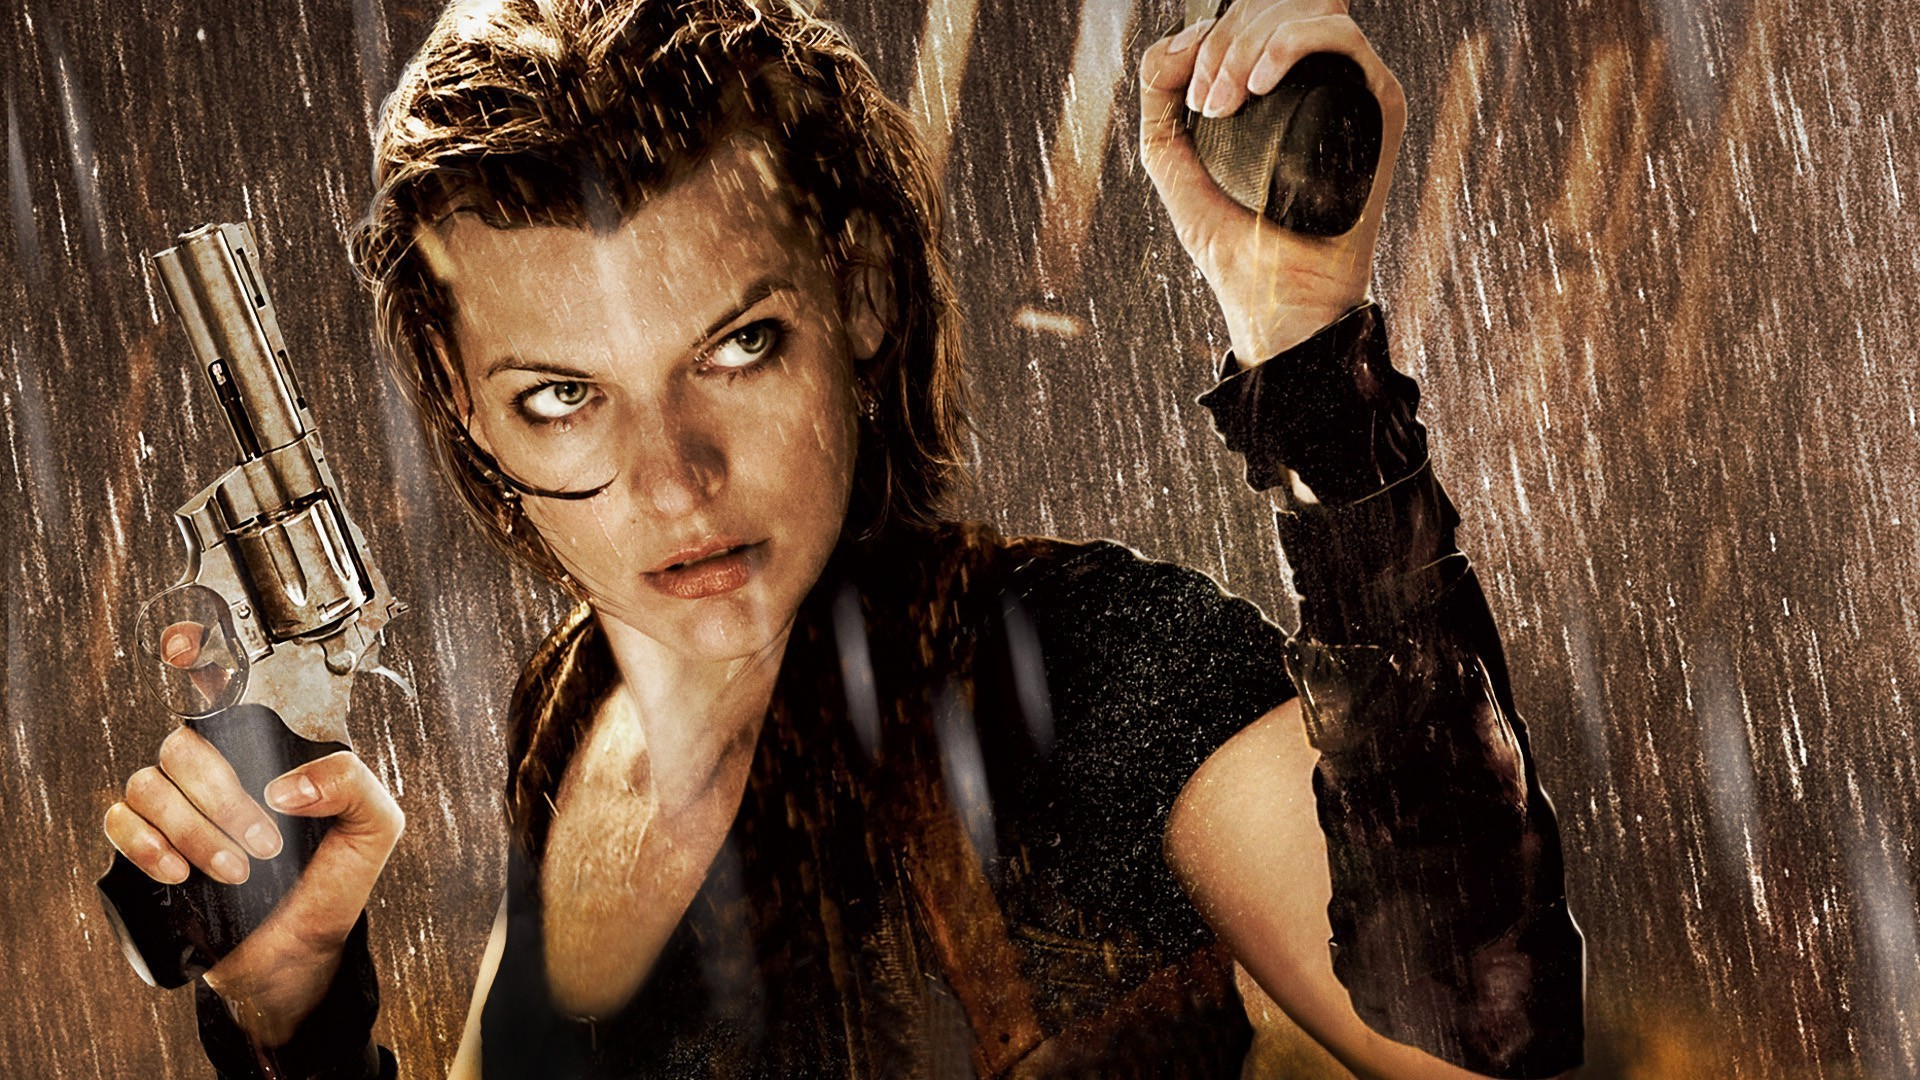 Milla Jovovich Hd Wallpaper